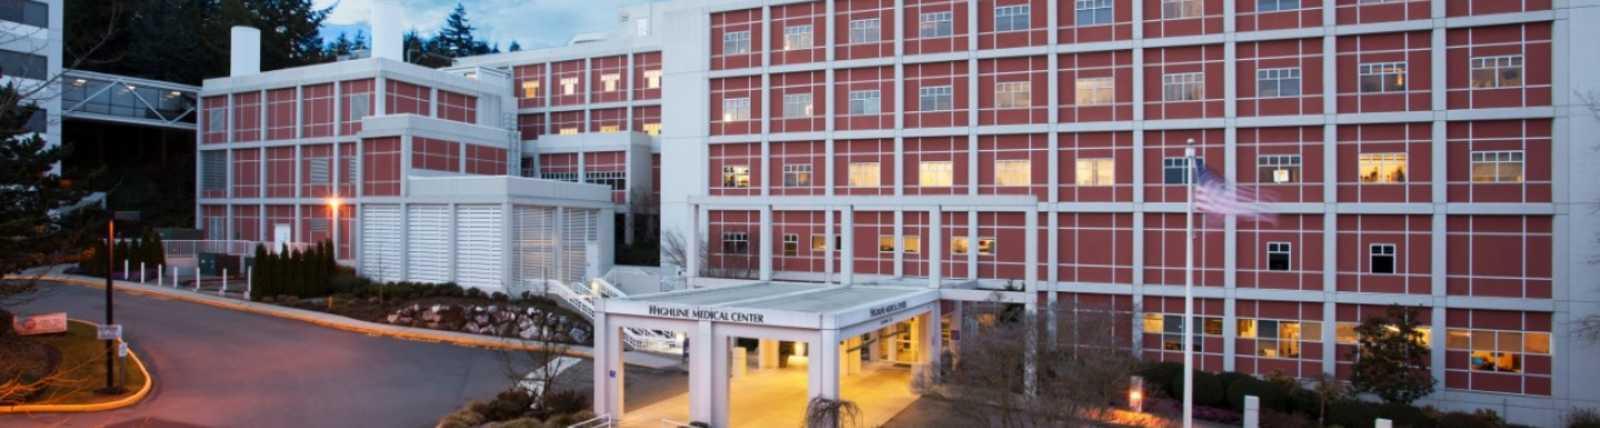 HIGHLINE MEDICAL CENTER FOUNDATION